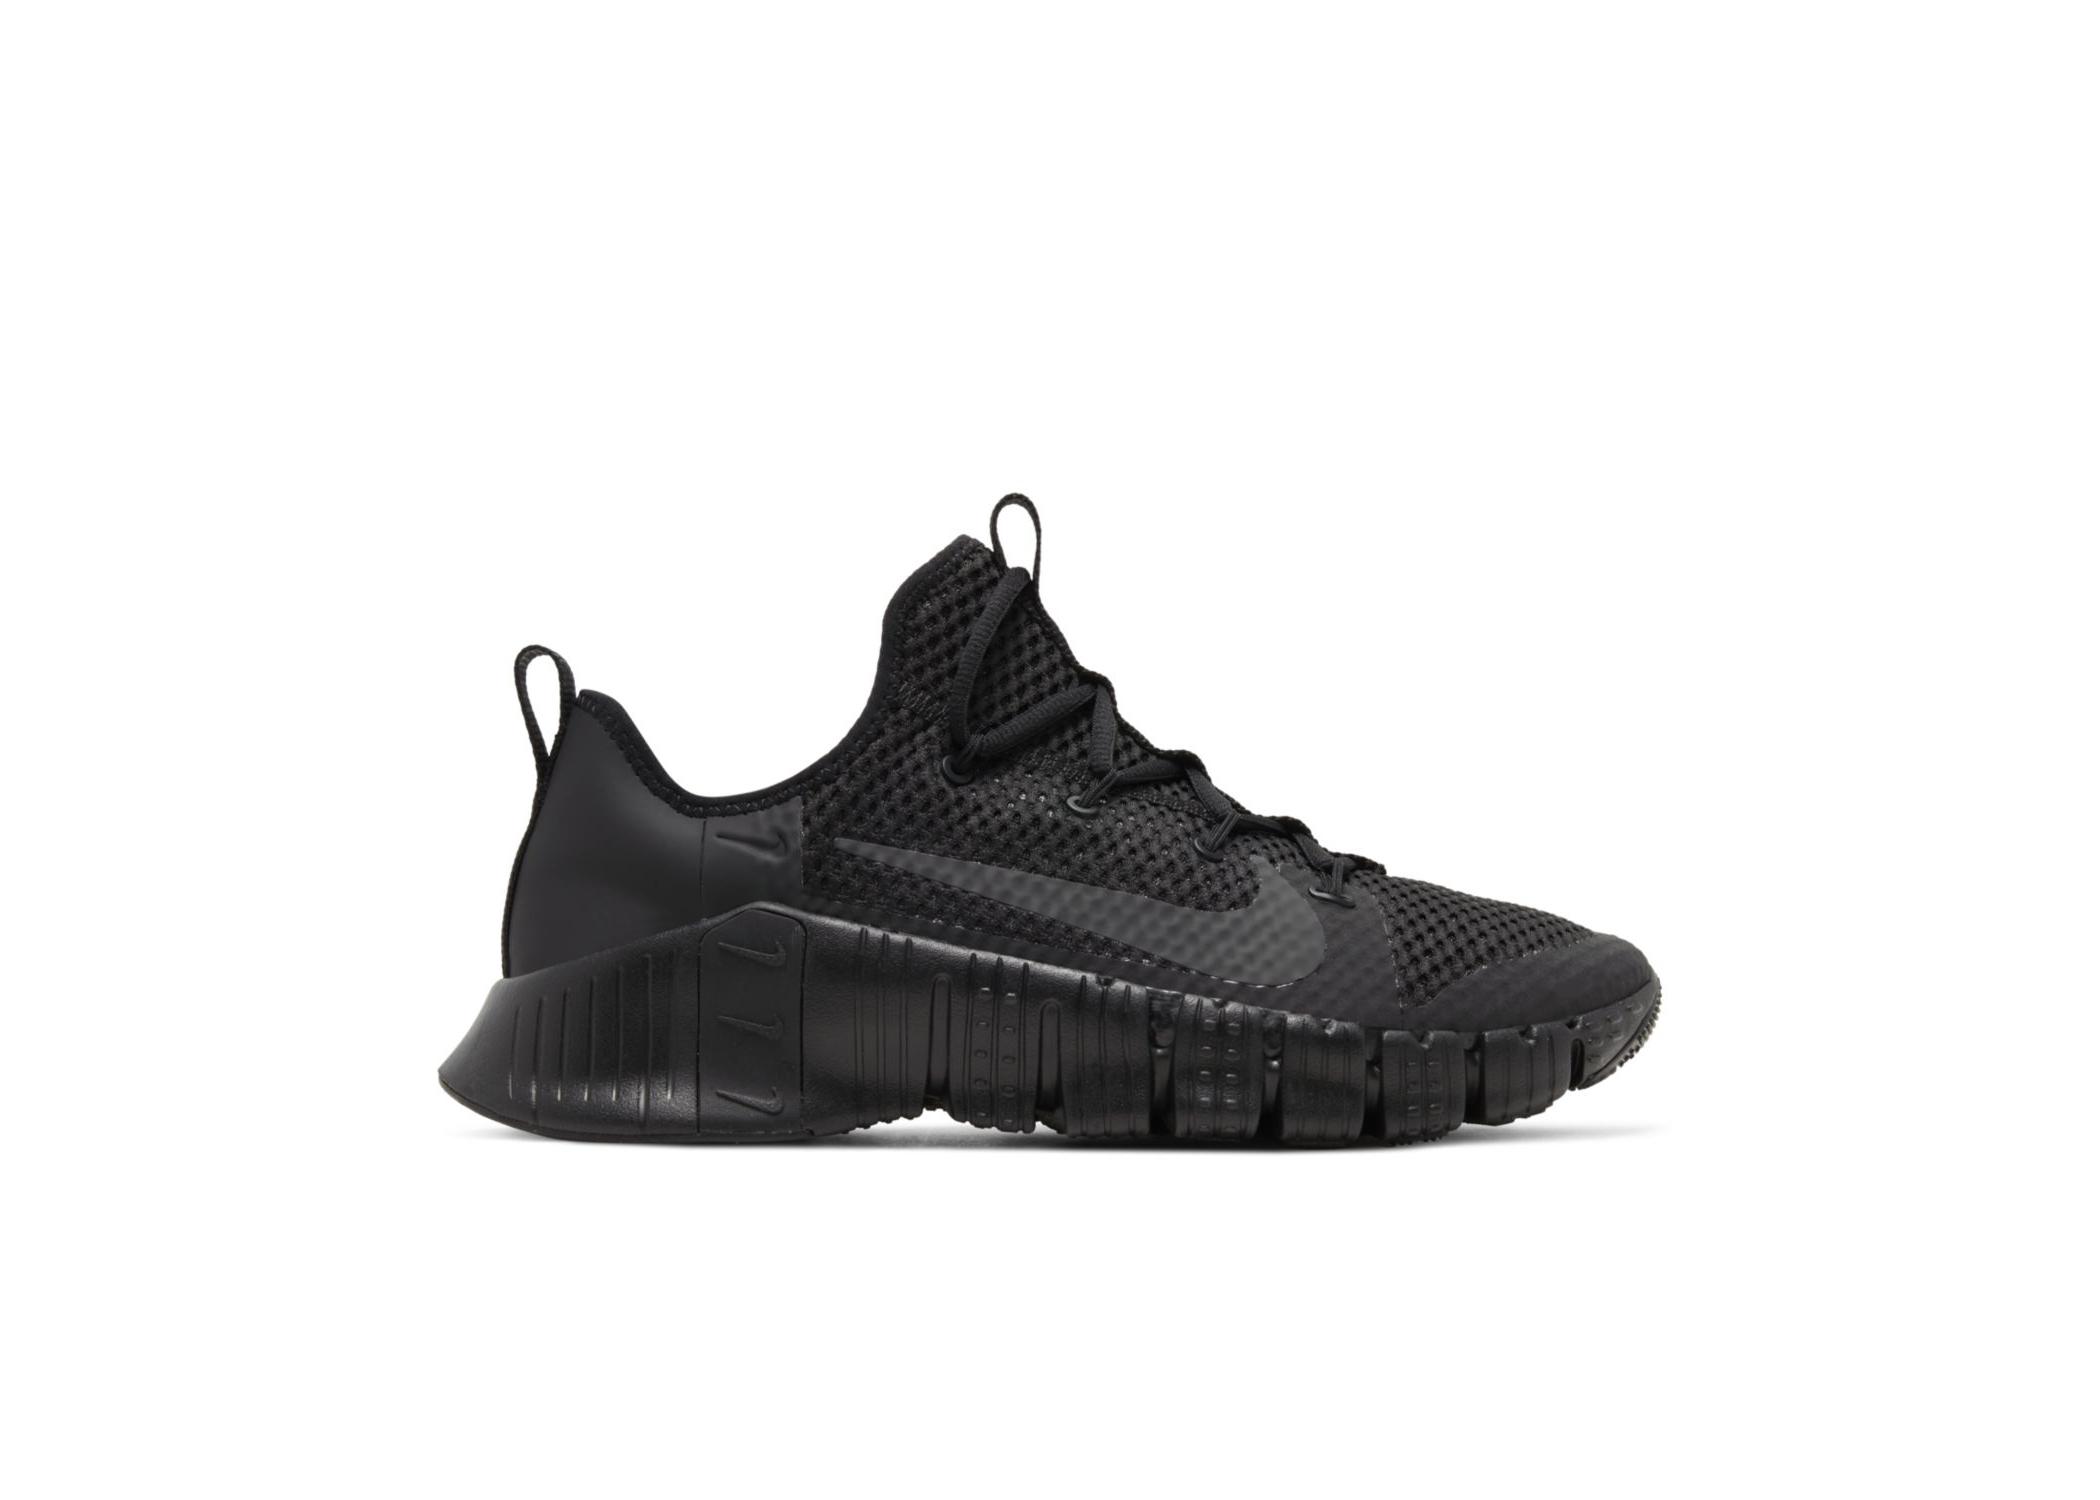 Nike Free Metcon 3 Black - CJ0861-001